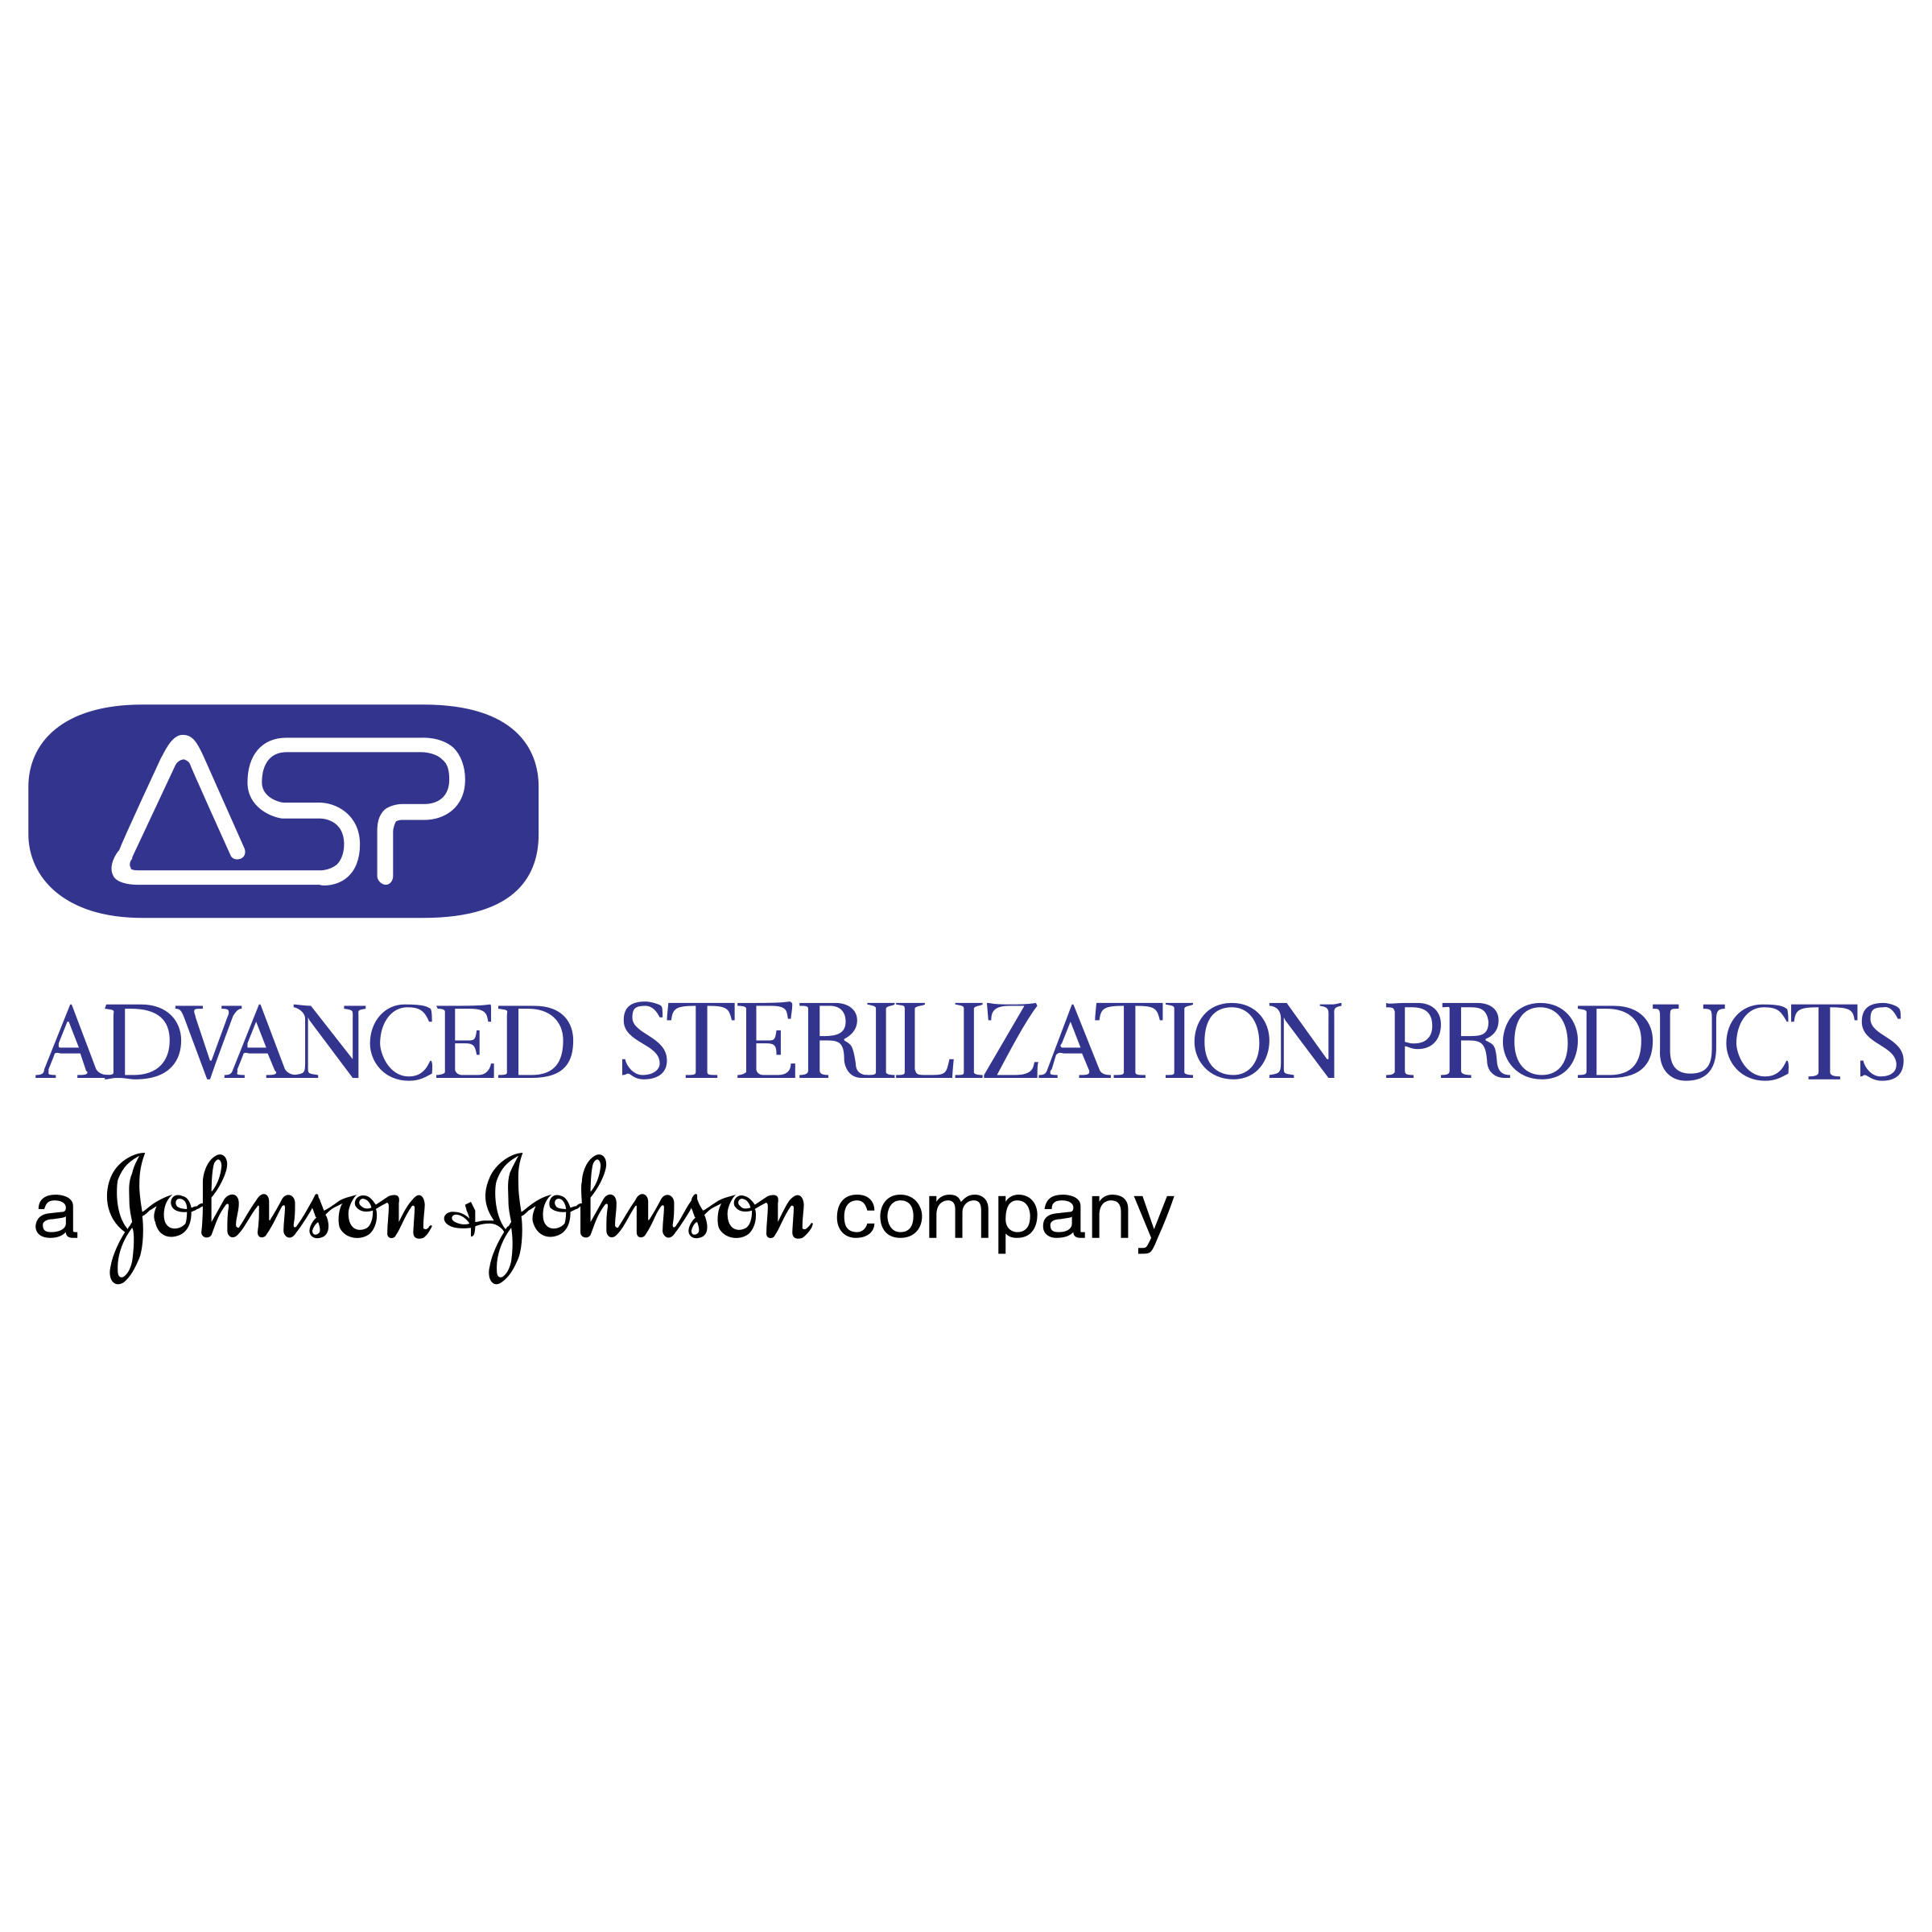 Advanced Sterilization Products 01 Logo PNG Transparent ...